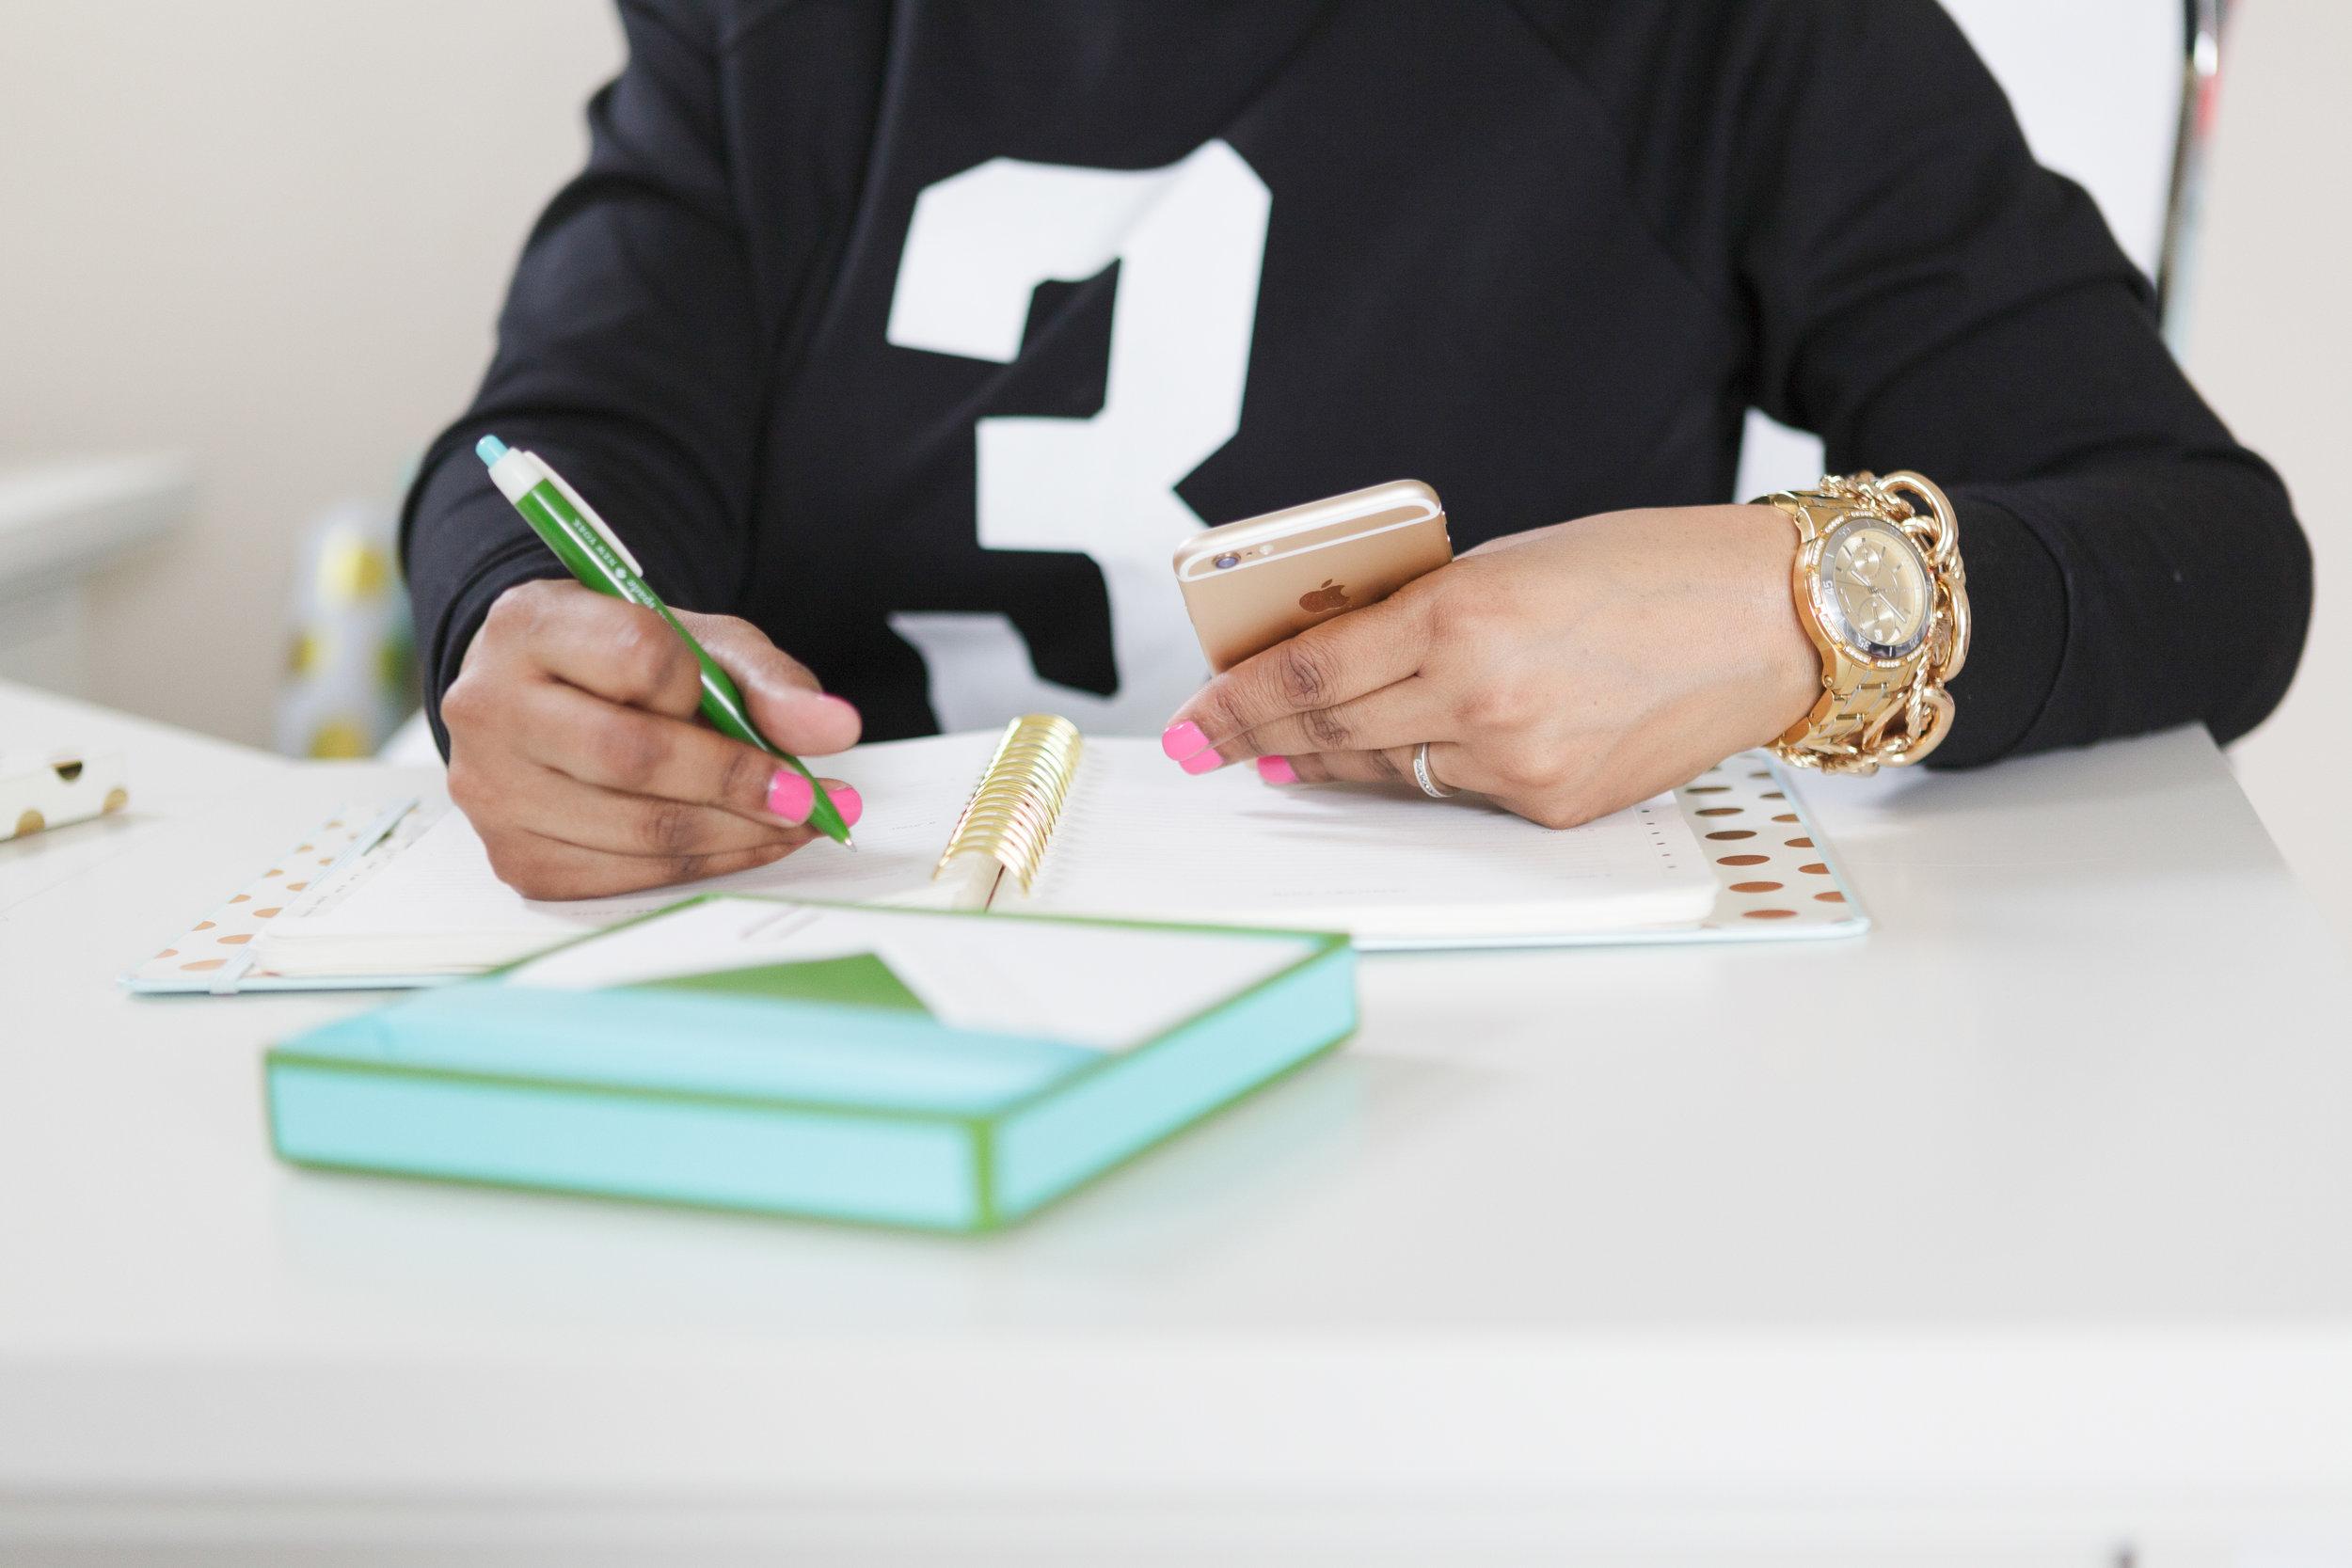 5 Mindset That Will Transform Your Finances - www.3stepsright.com